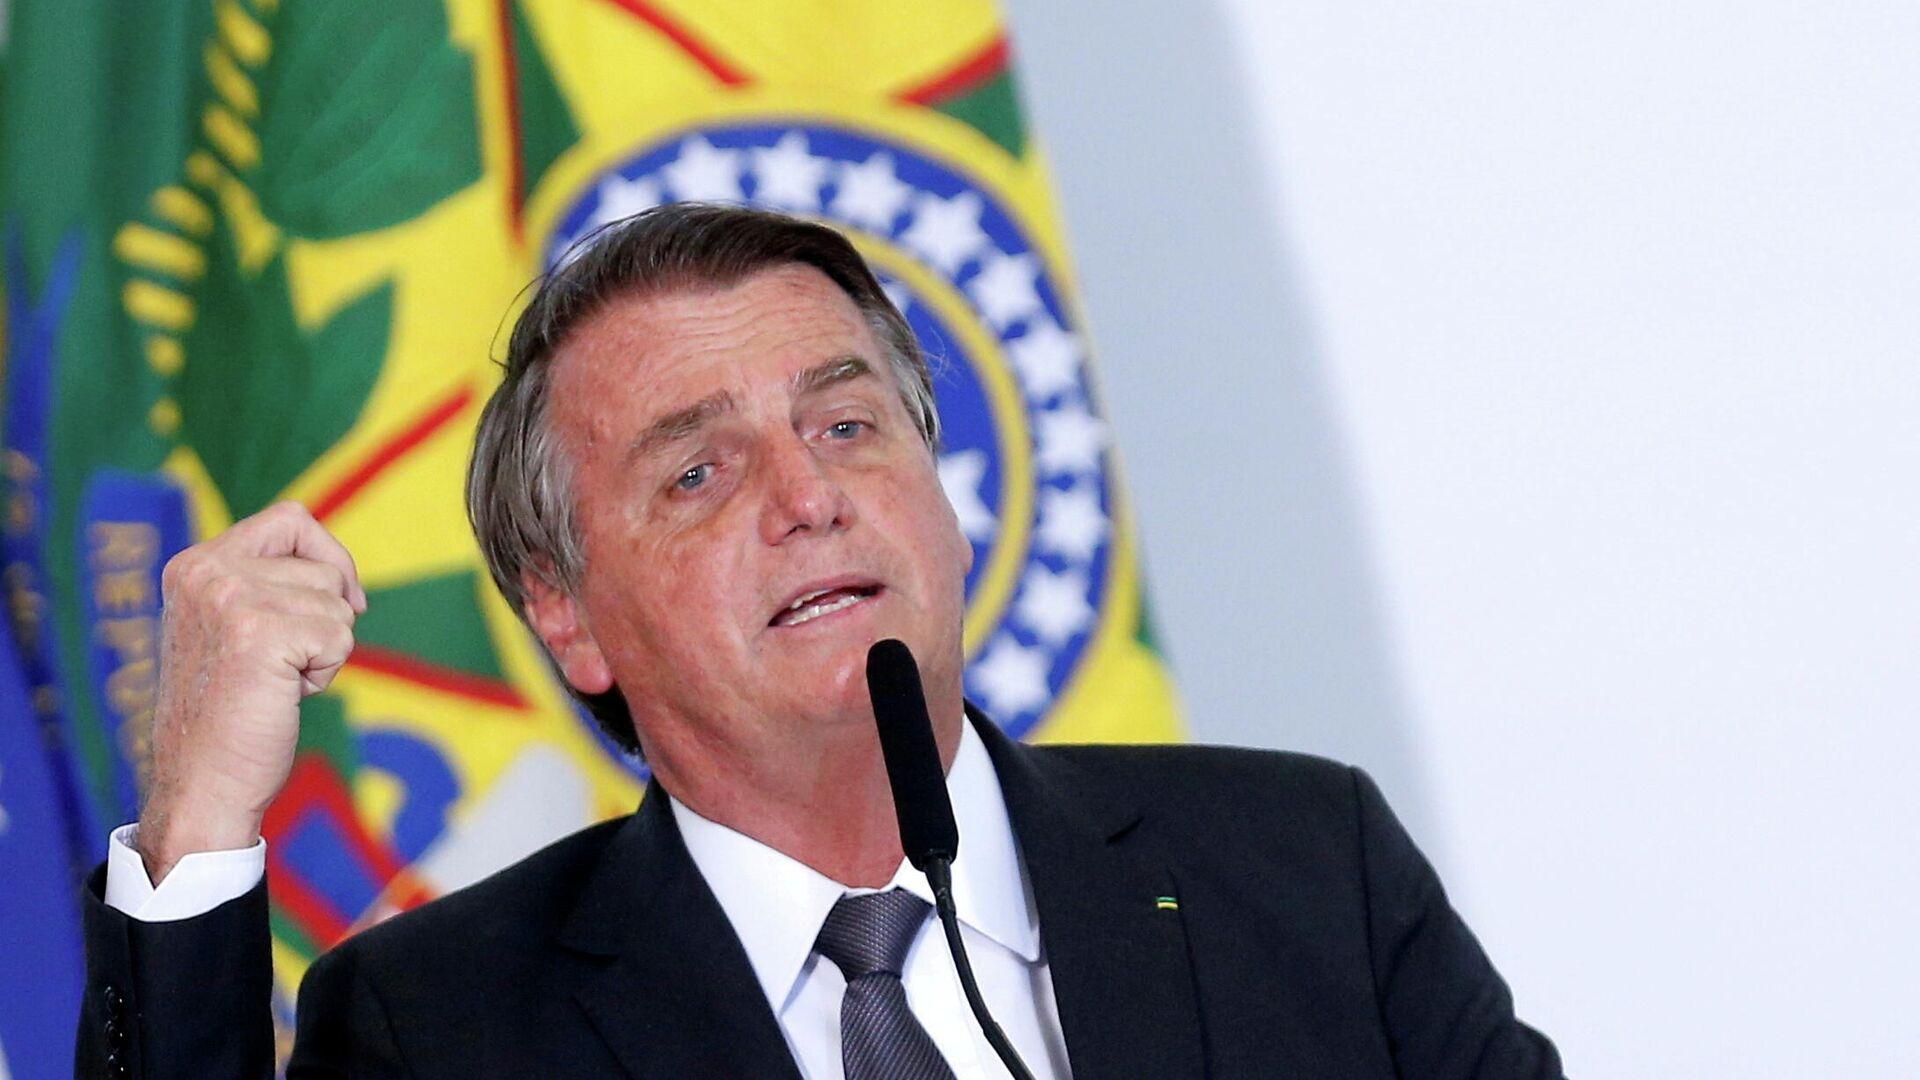 Jair Bolsonaro, presidente de Brasil - Sputnik Mundo, 1920, 02.08.2021